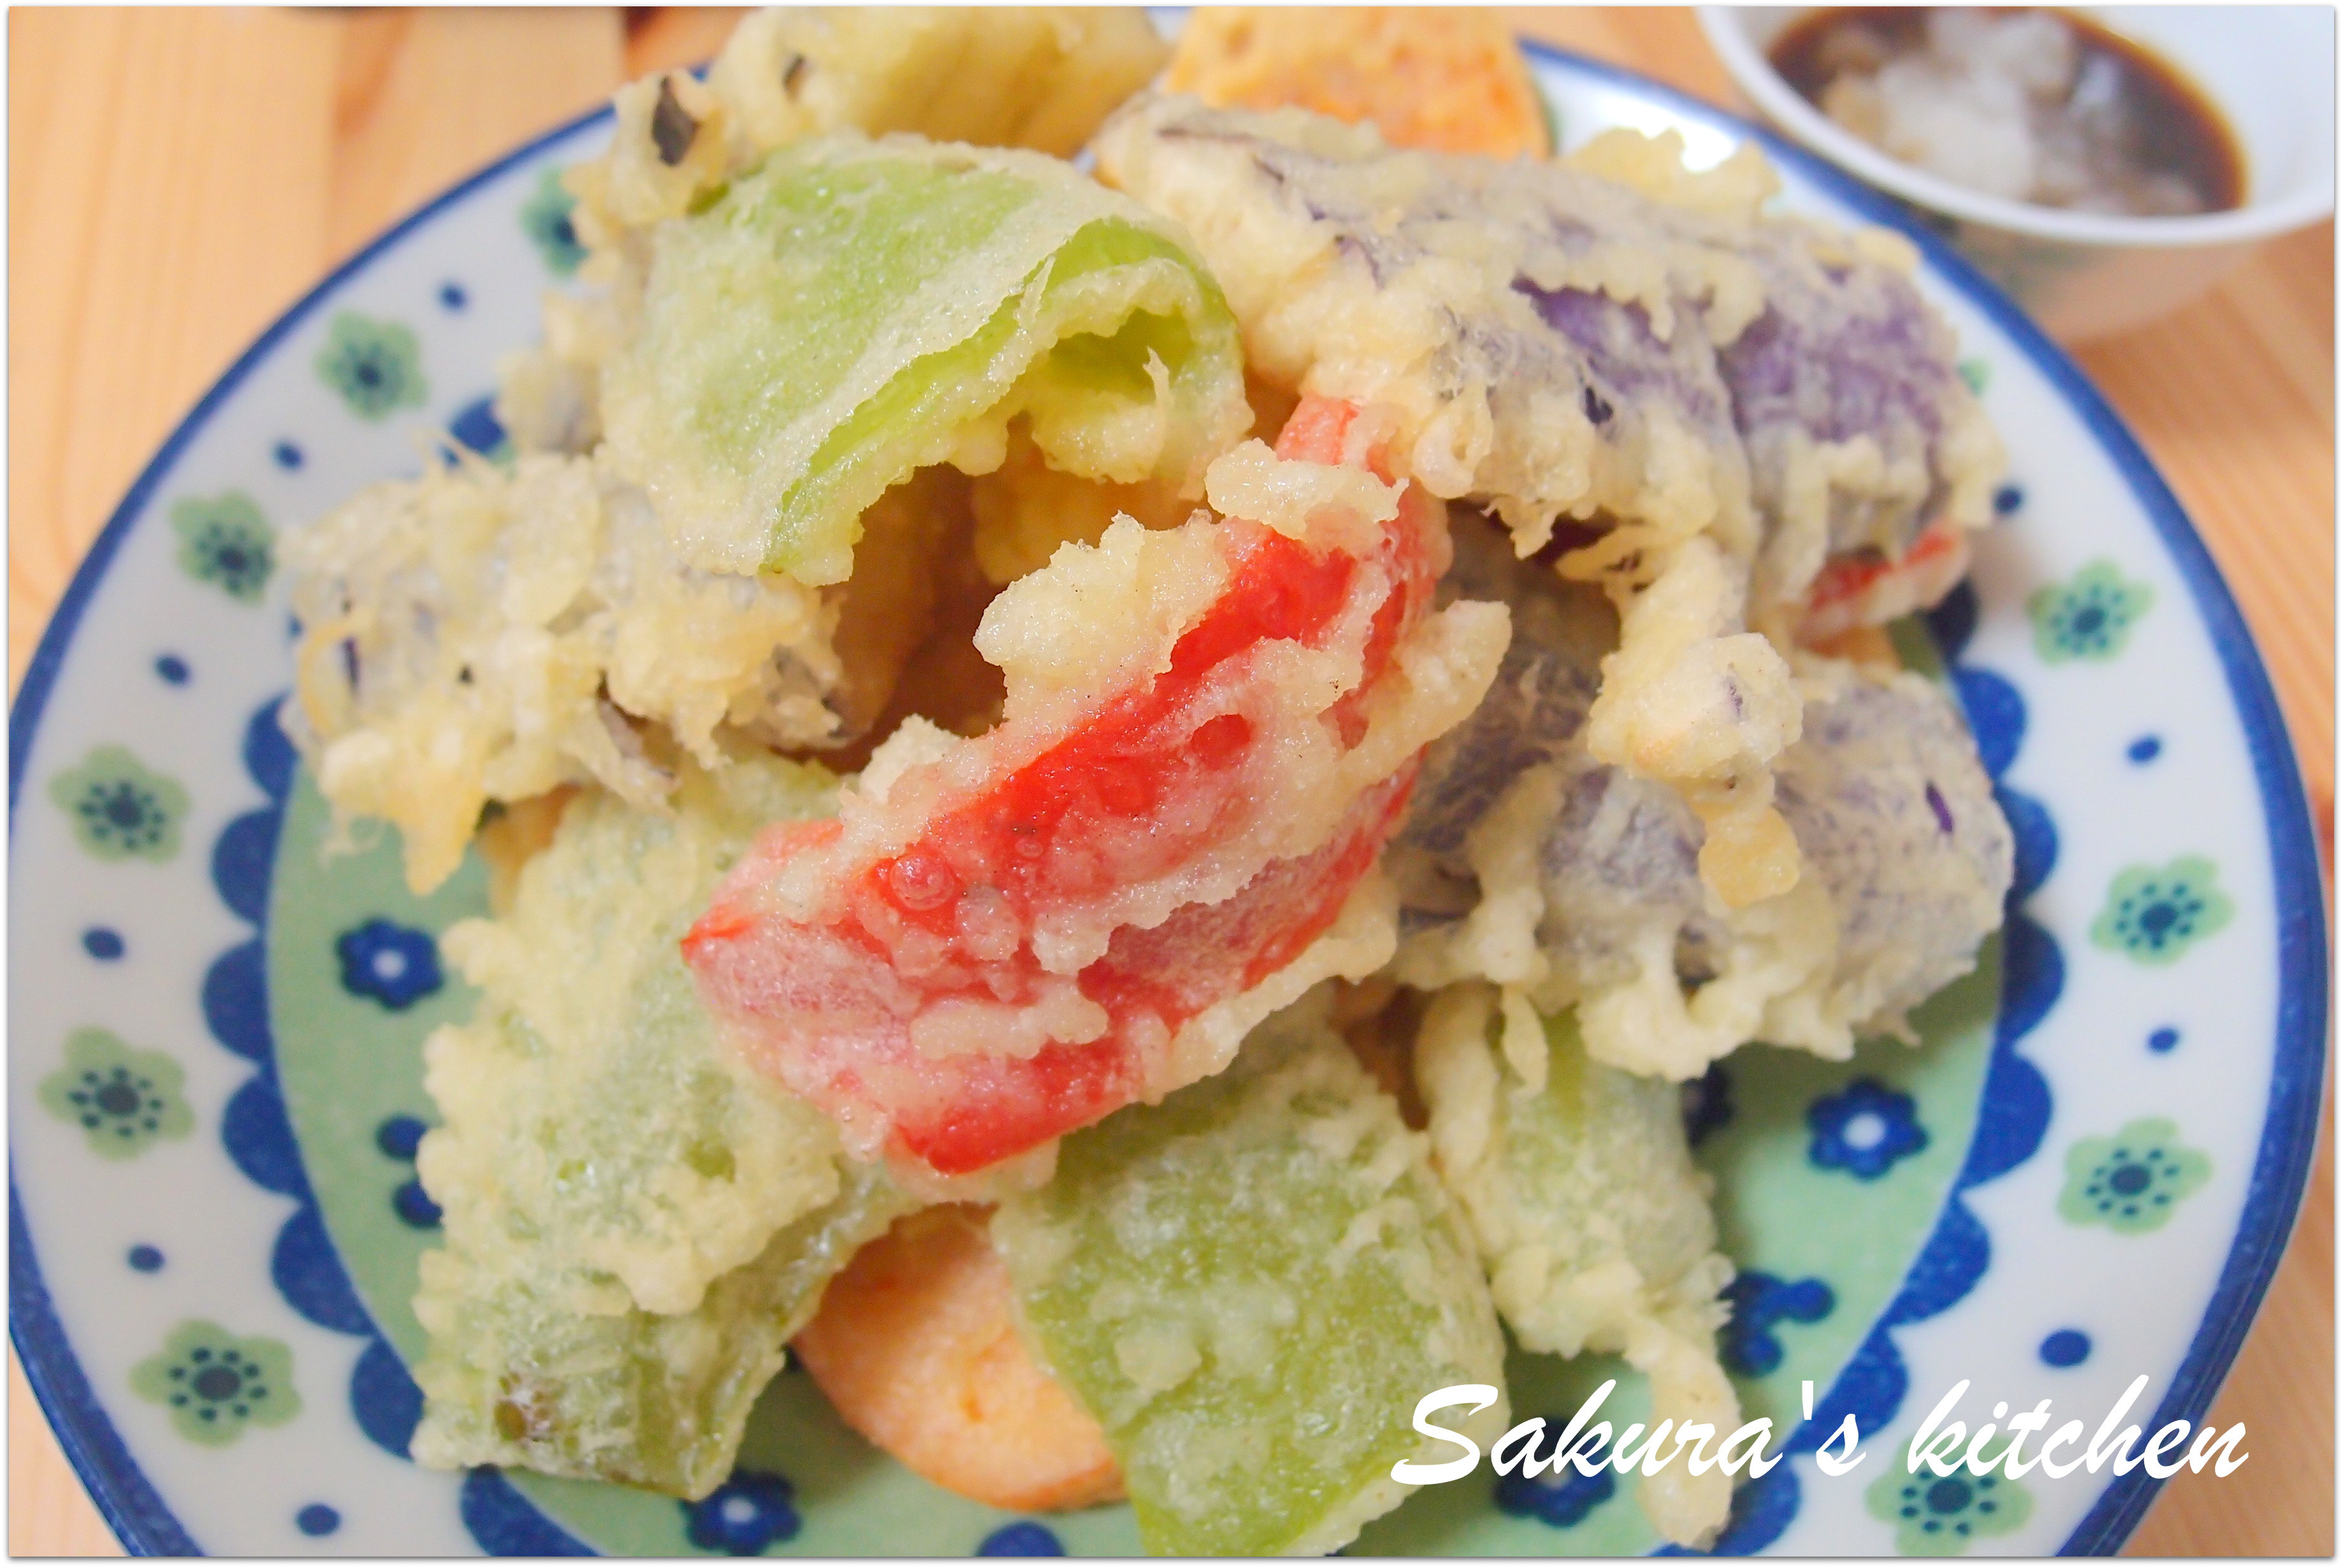 ♥我的手作料理♥ 日式蔬菜天婦羅 天ぷら